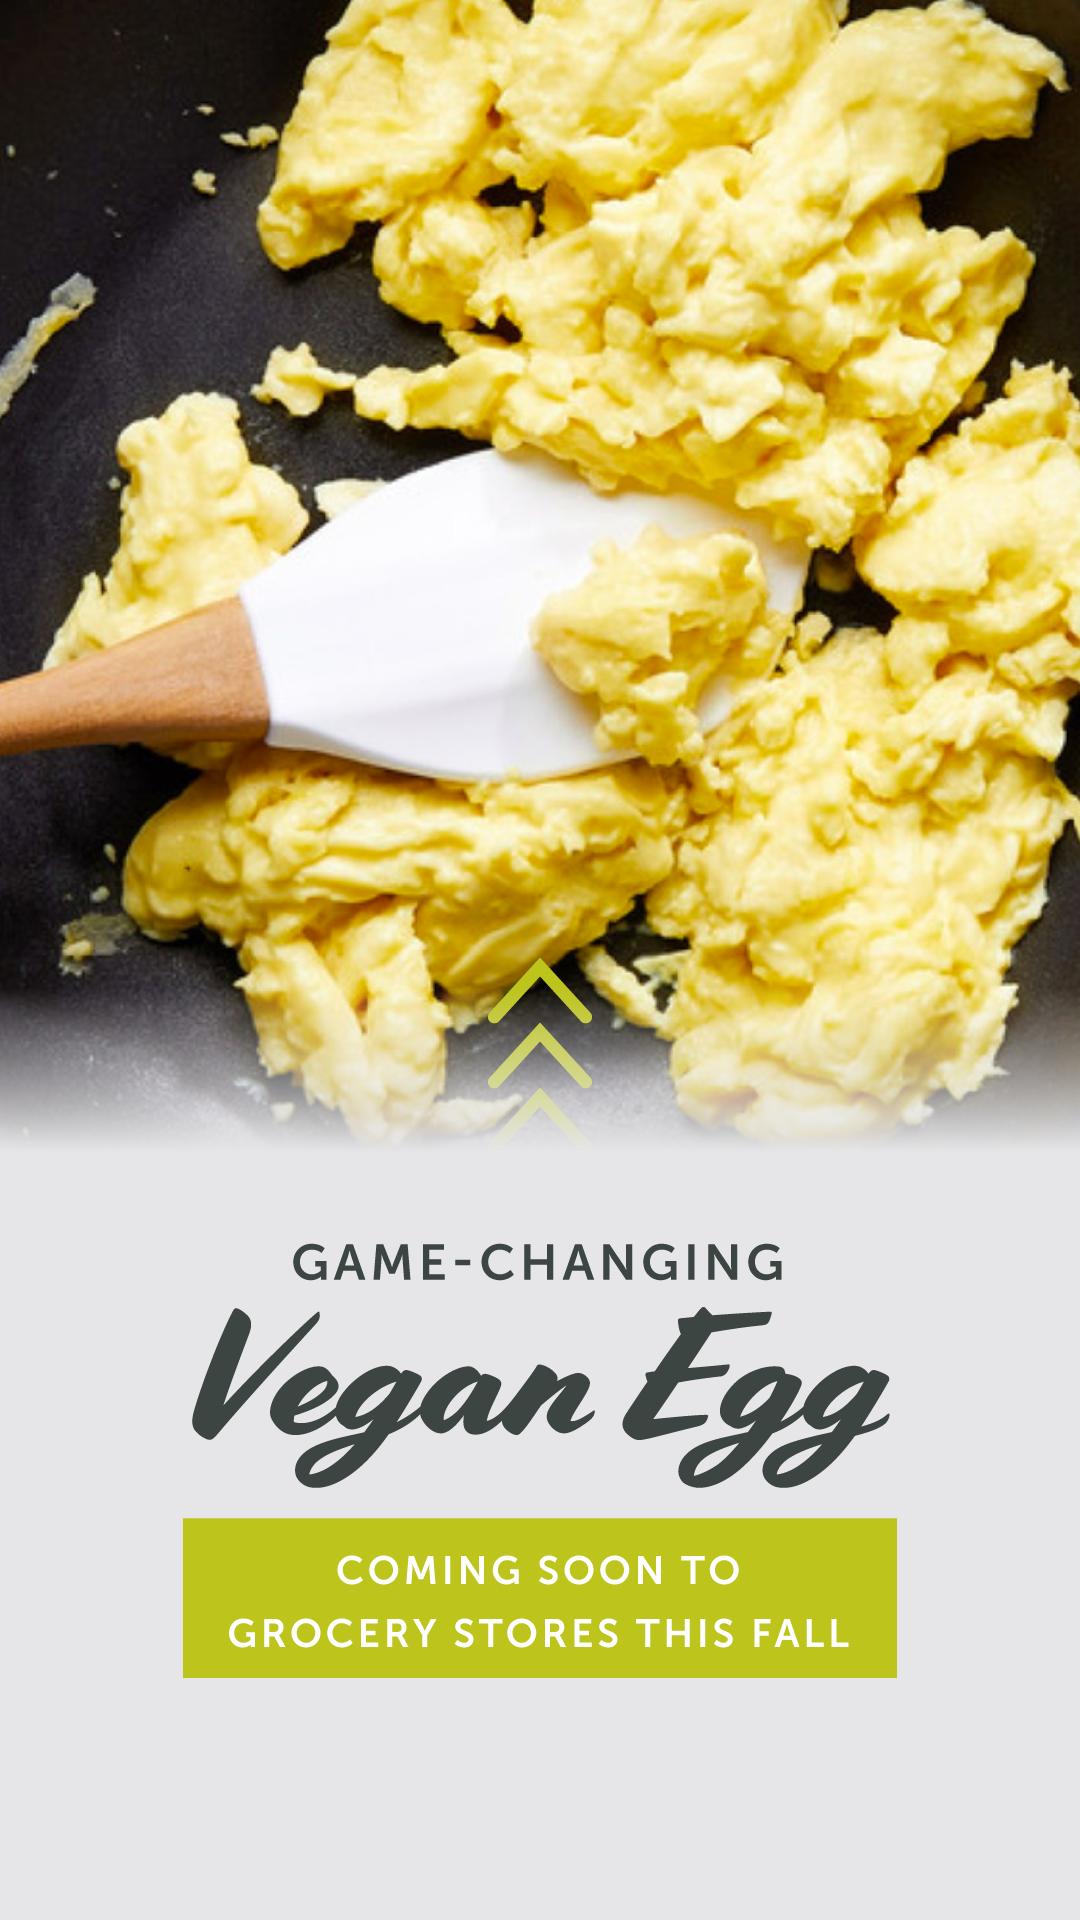 Game Changing Vegan Egg Coming To Grocery Stores This Fall Vegan Eggs Vegan Vegetarian Recipes